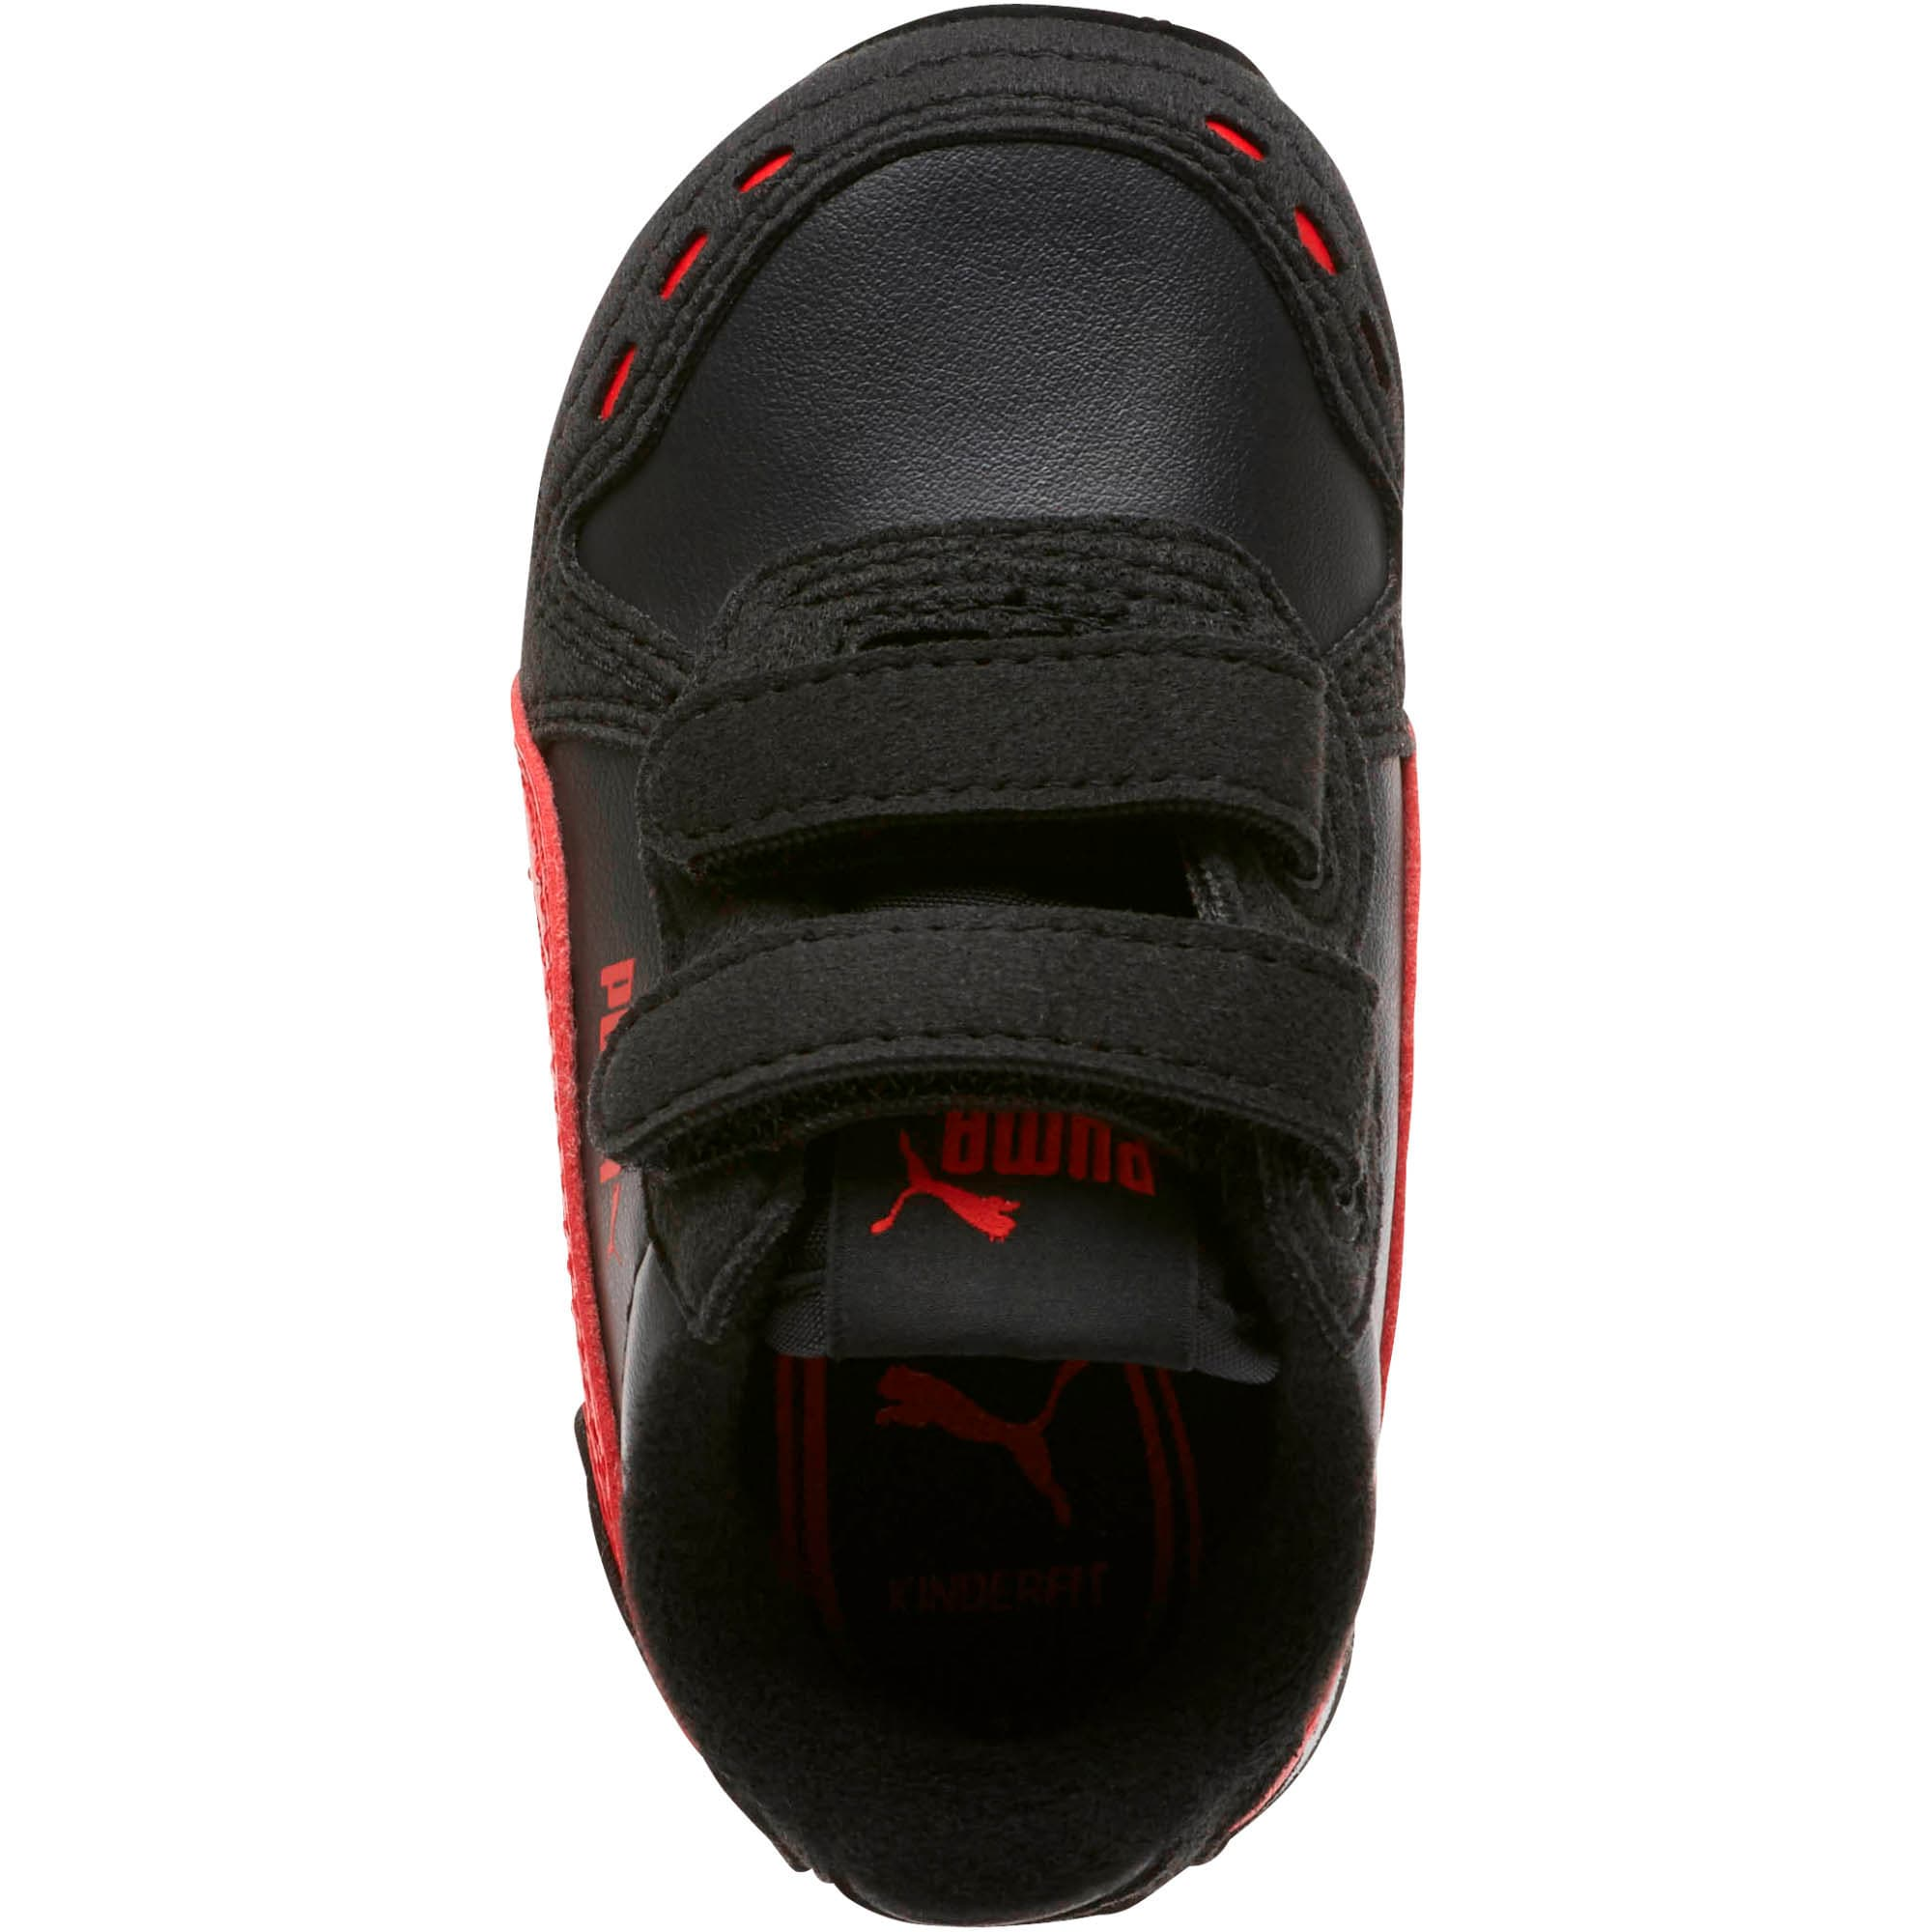 Thumbnail 5 of Cabana Racer SL Toddler Shoes, Puma Black-High Risk Red, medium